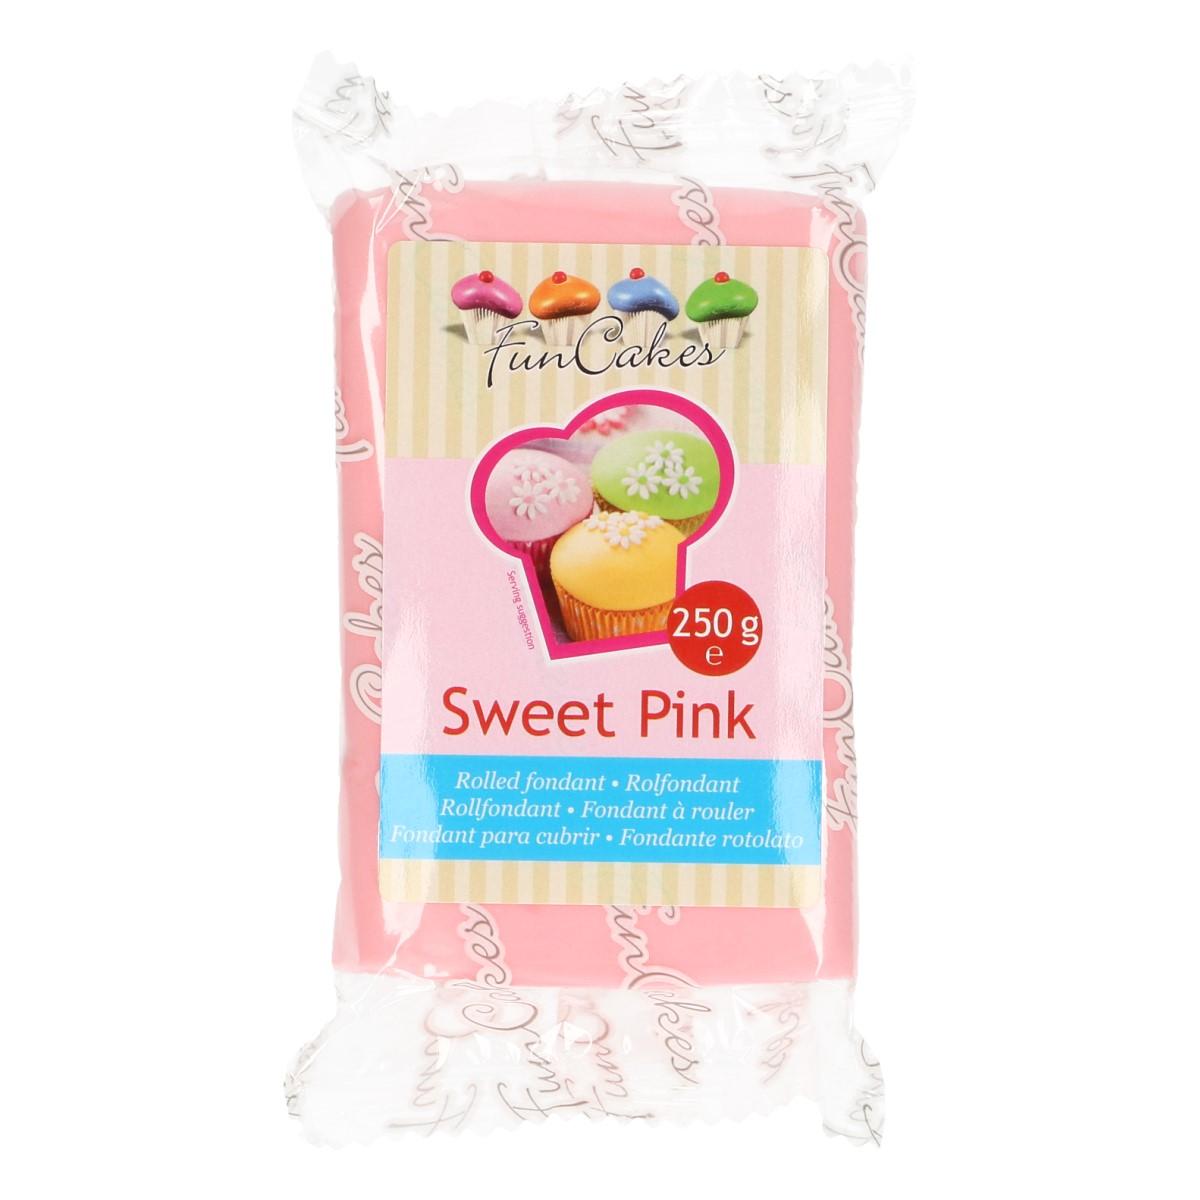 Roll fondant Sweet Pink - cukríkovo ružový 250 g